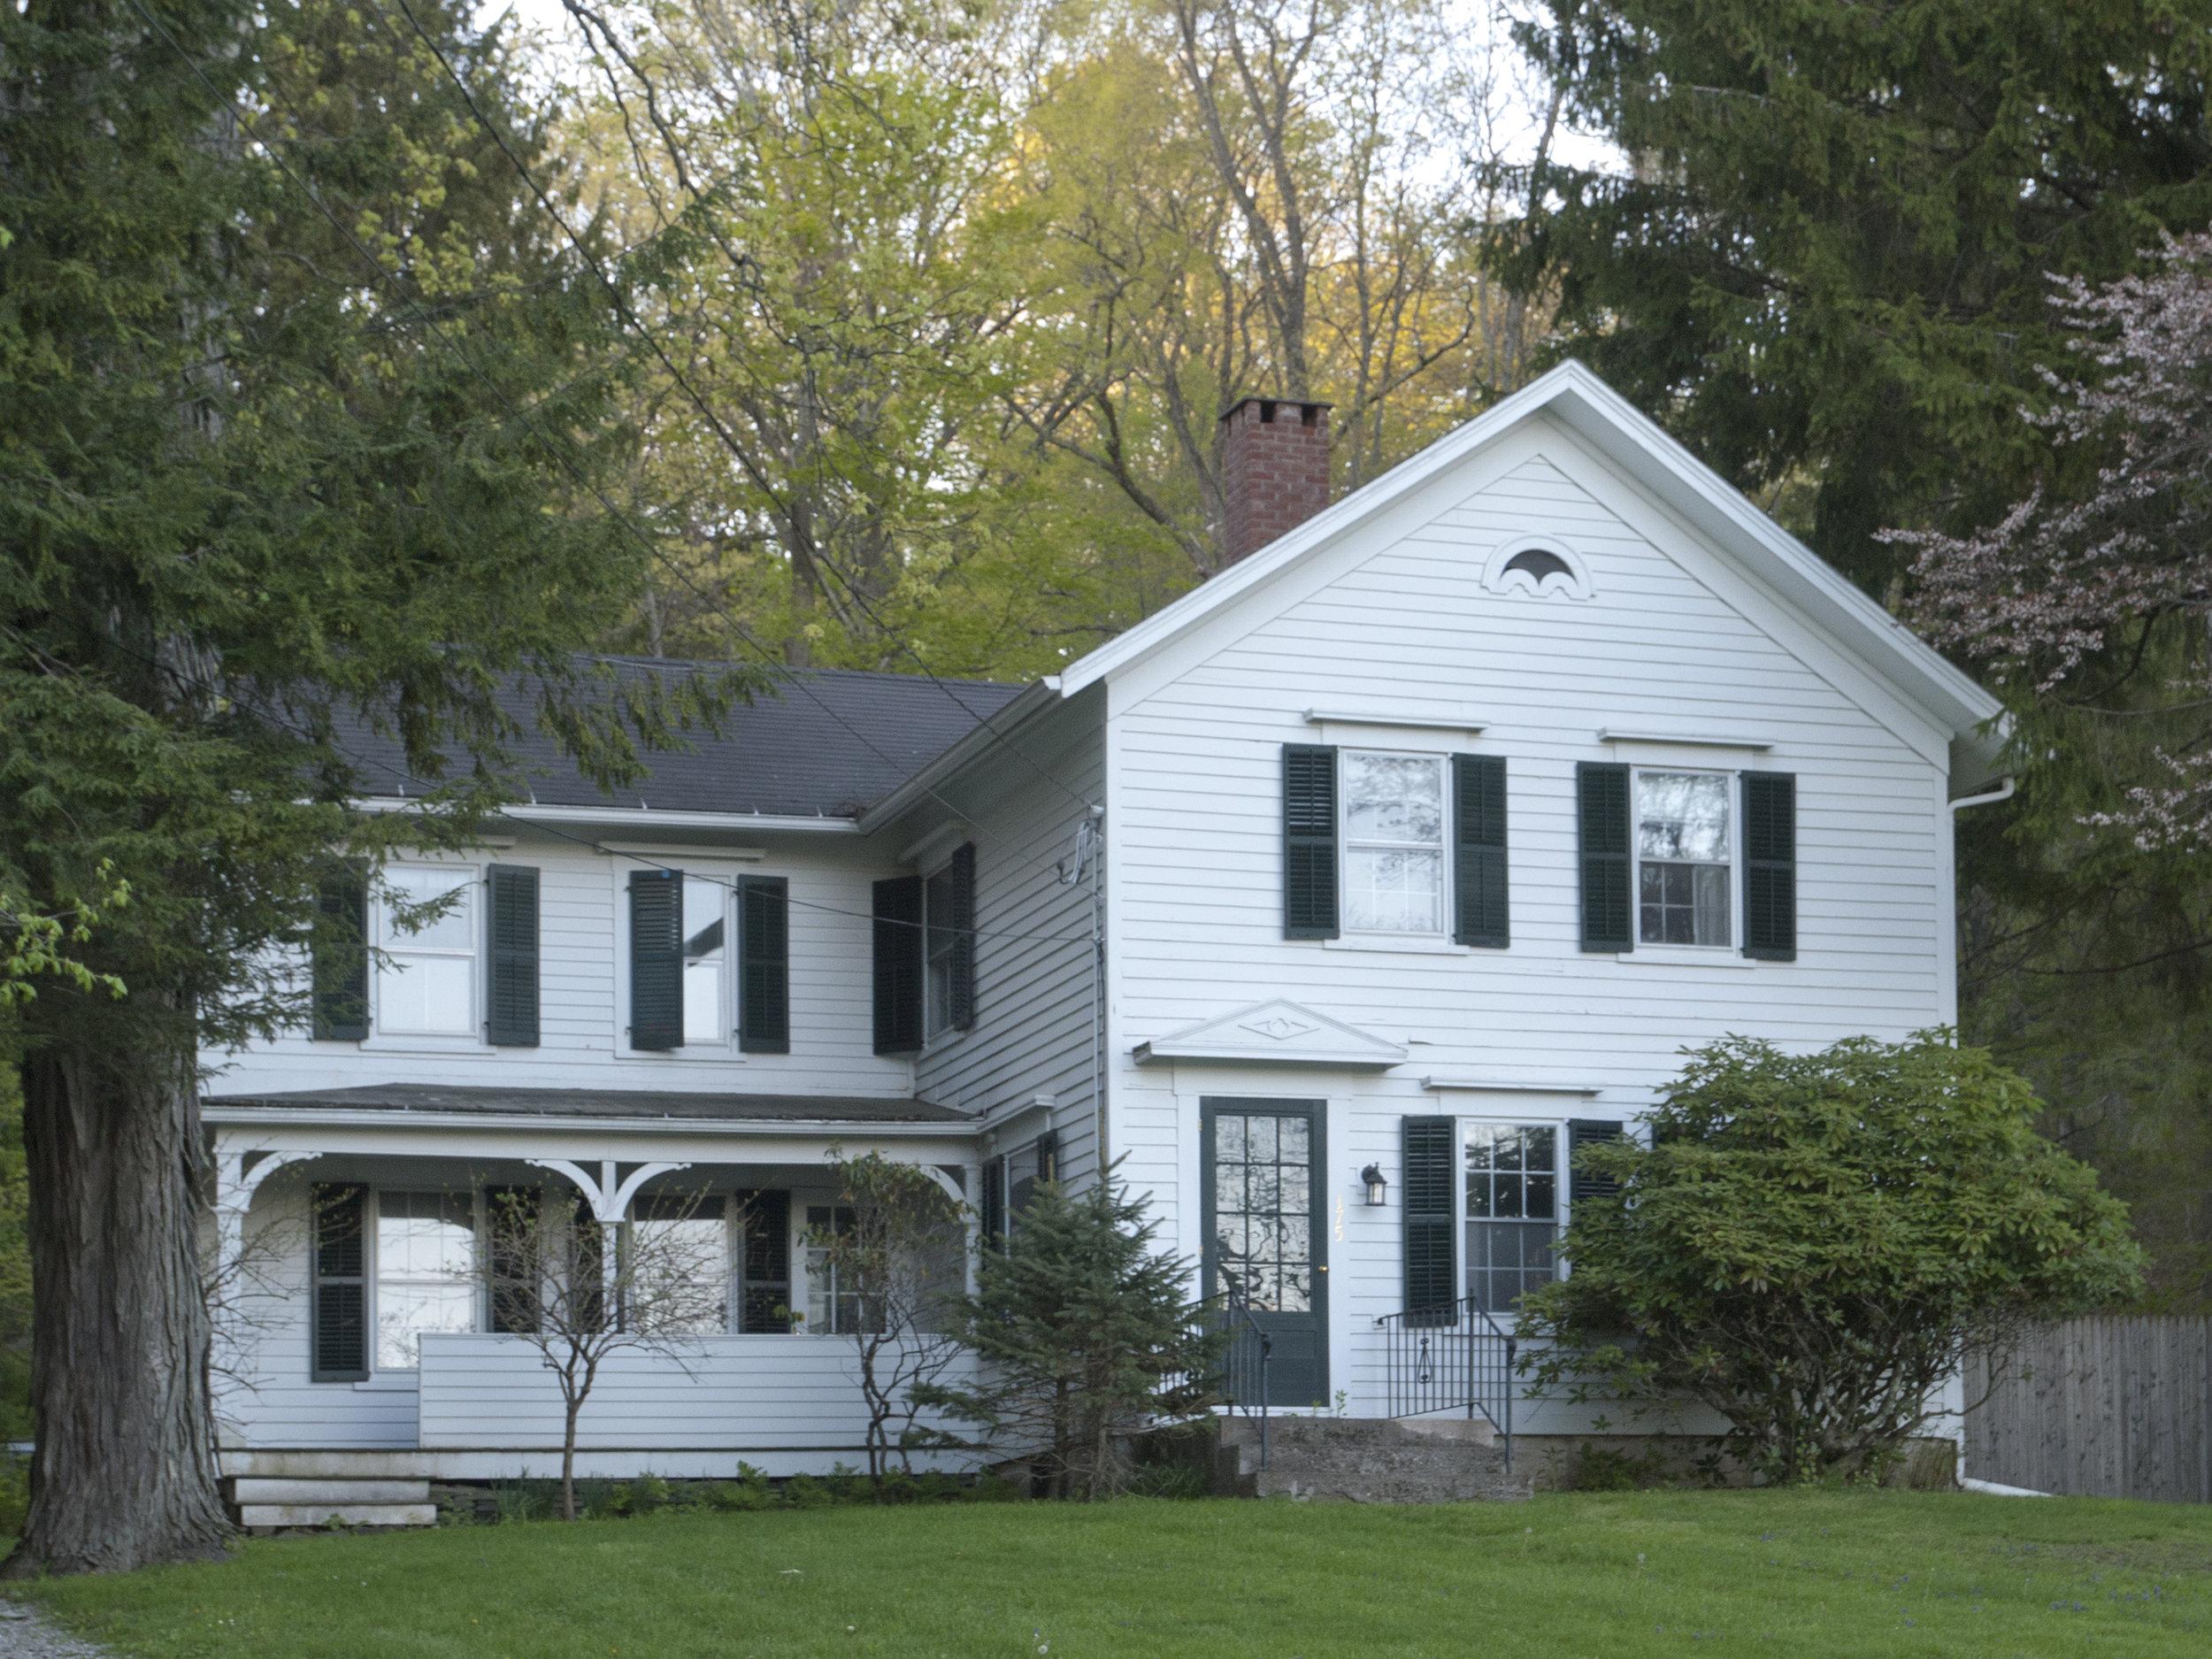 Tom Callahan's house,175 Main Street, not on site, Lakeville or Salisbury?.jpg